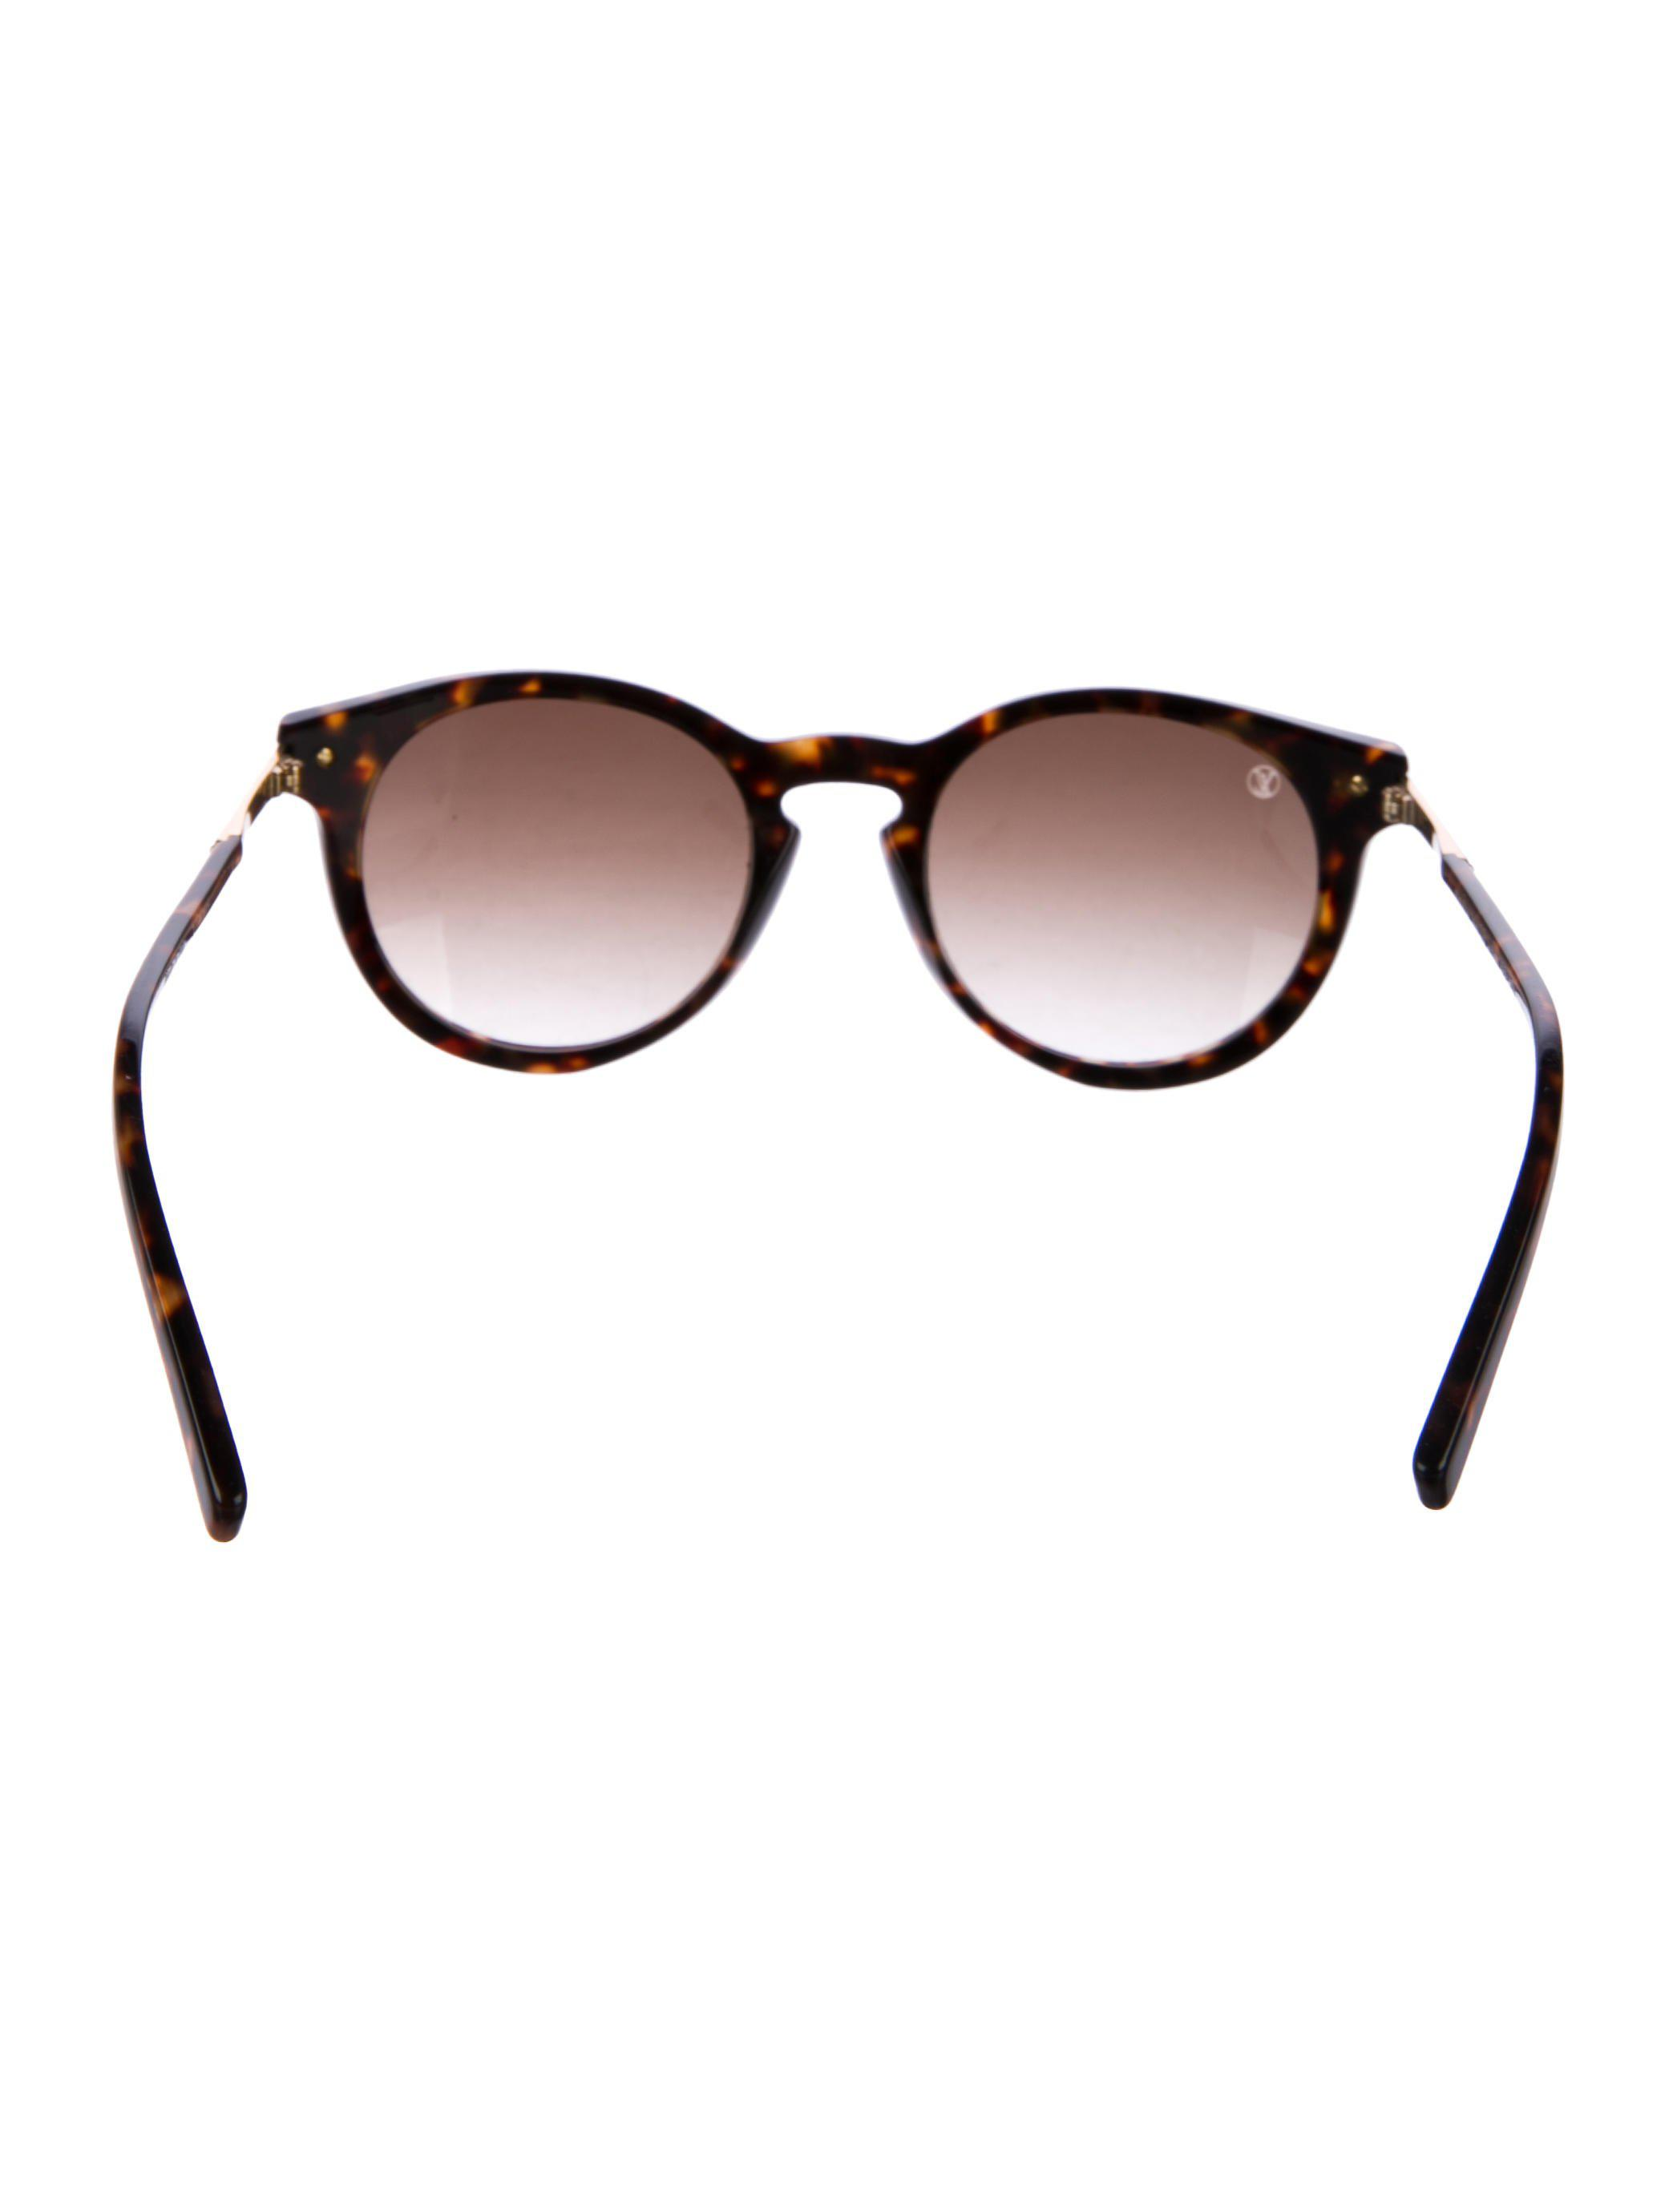 30a19648938 Lyst - Louis Vuitton Rosalie Tortoiseshell Sunglasses Gold in Metallic